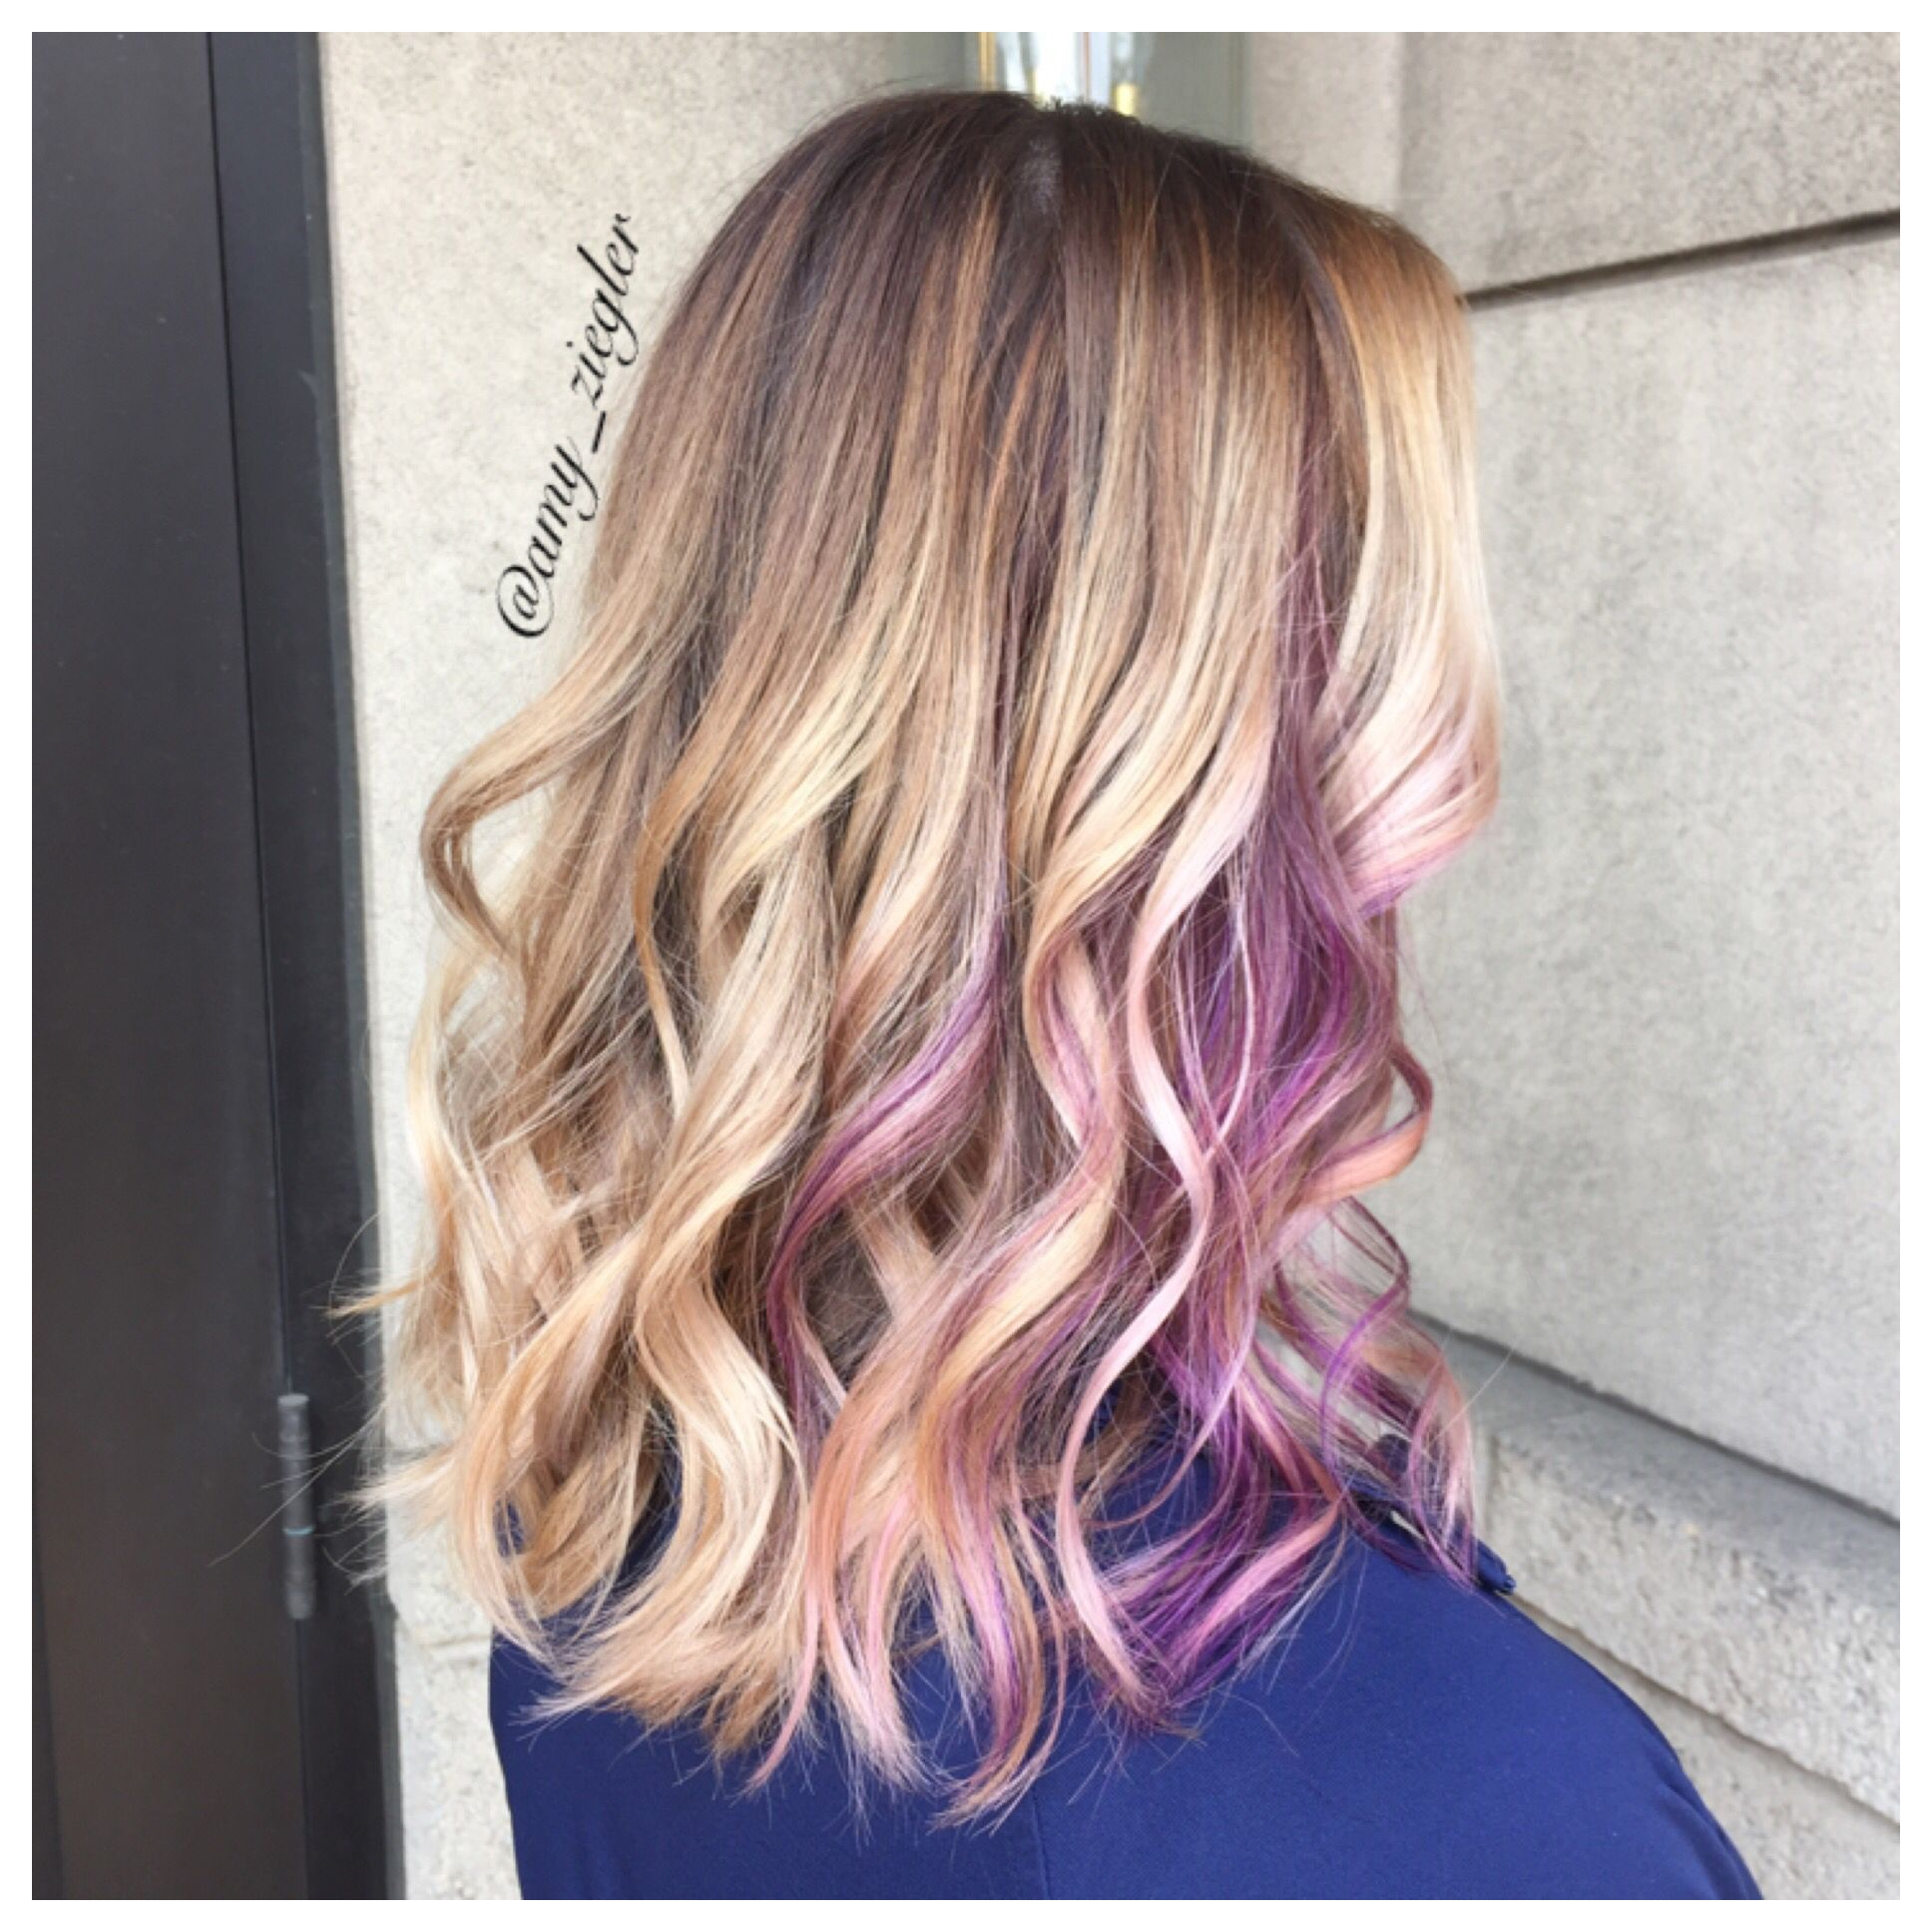 Blonde Balayage And Purple Peekaboo By Askforamy Versatilestrands Blonde Hair With Highlights Peekaboo Hair Purple Peekaboo Hair